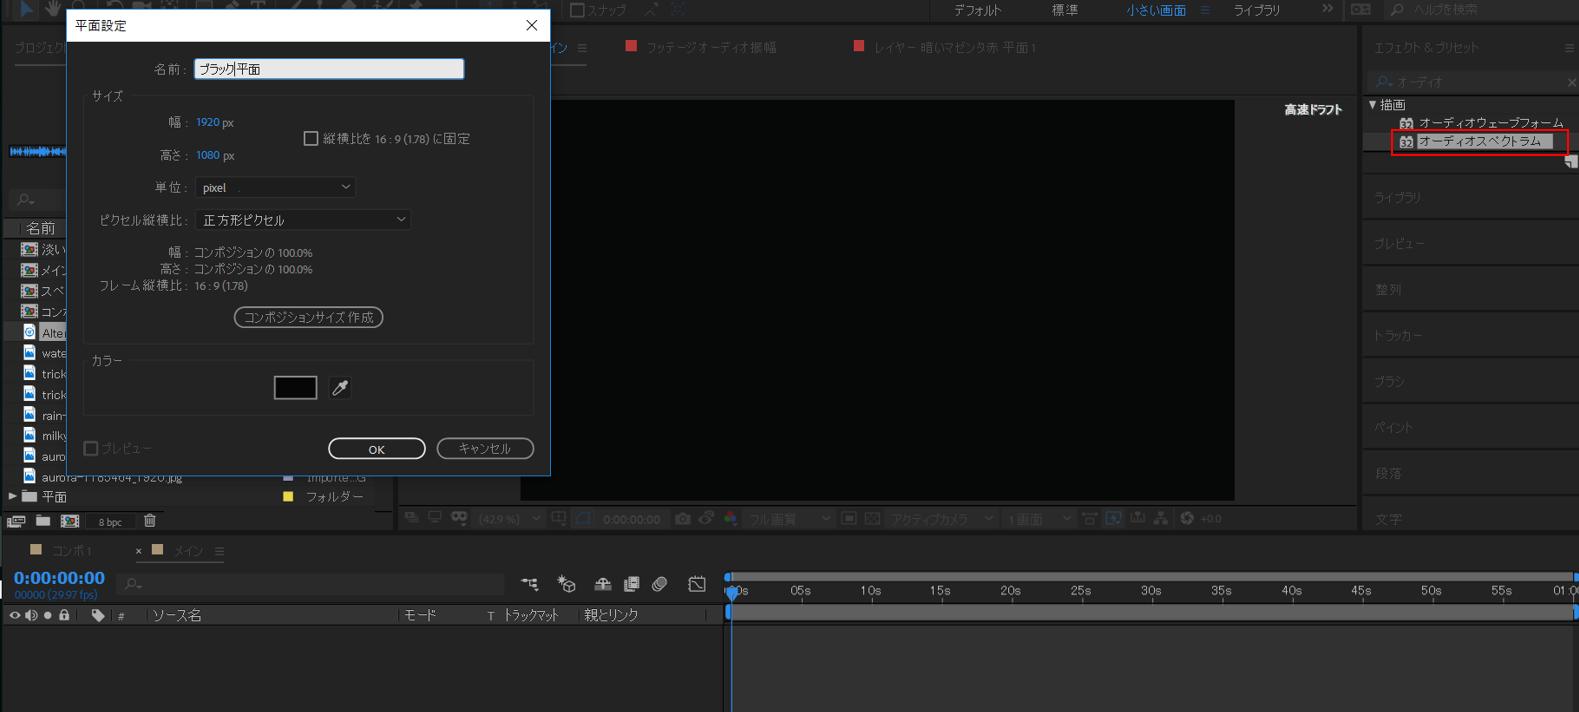 【After Effects】音に合わせて動くオーディオスペクトラムの使い方1